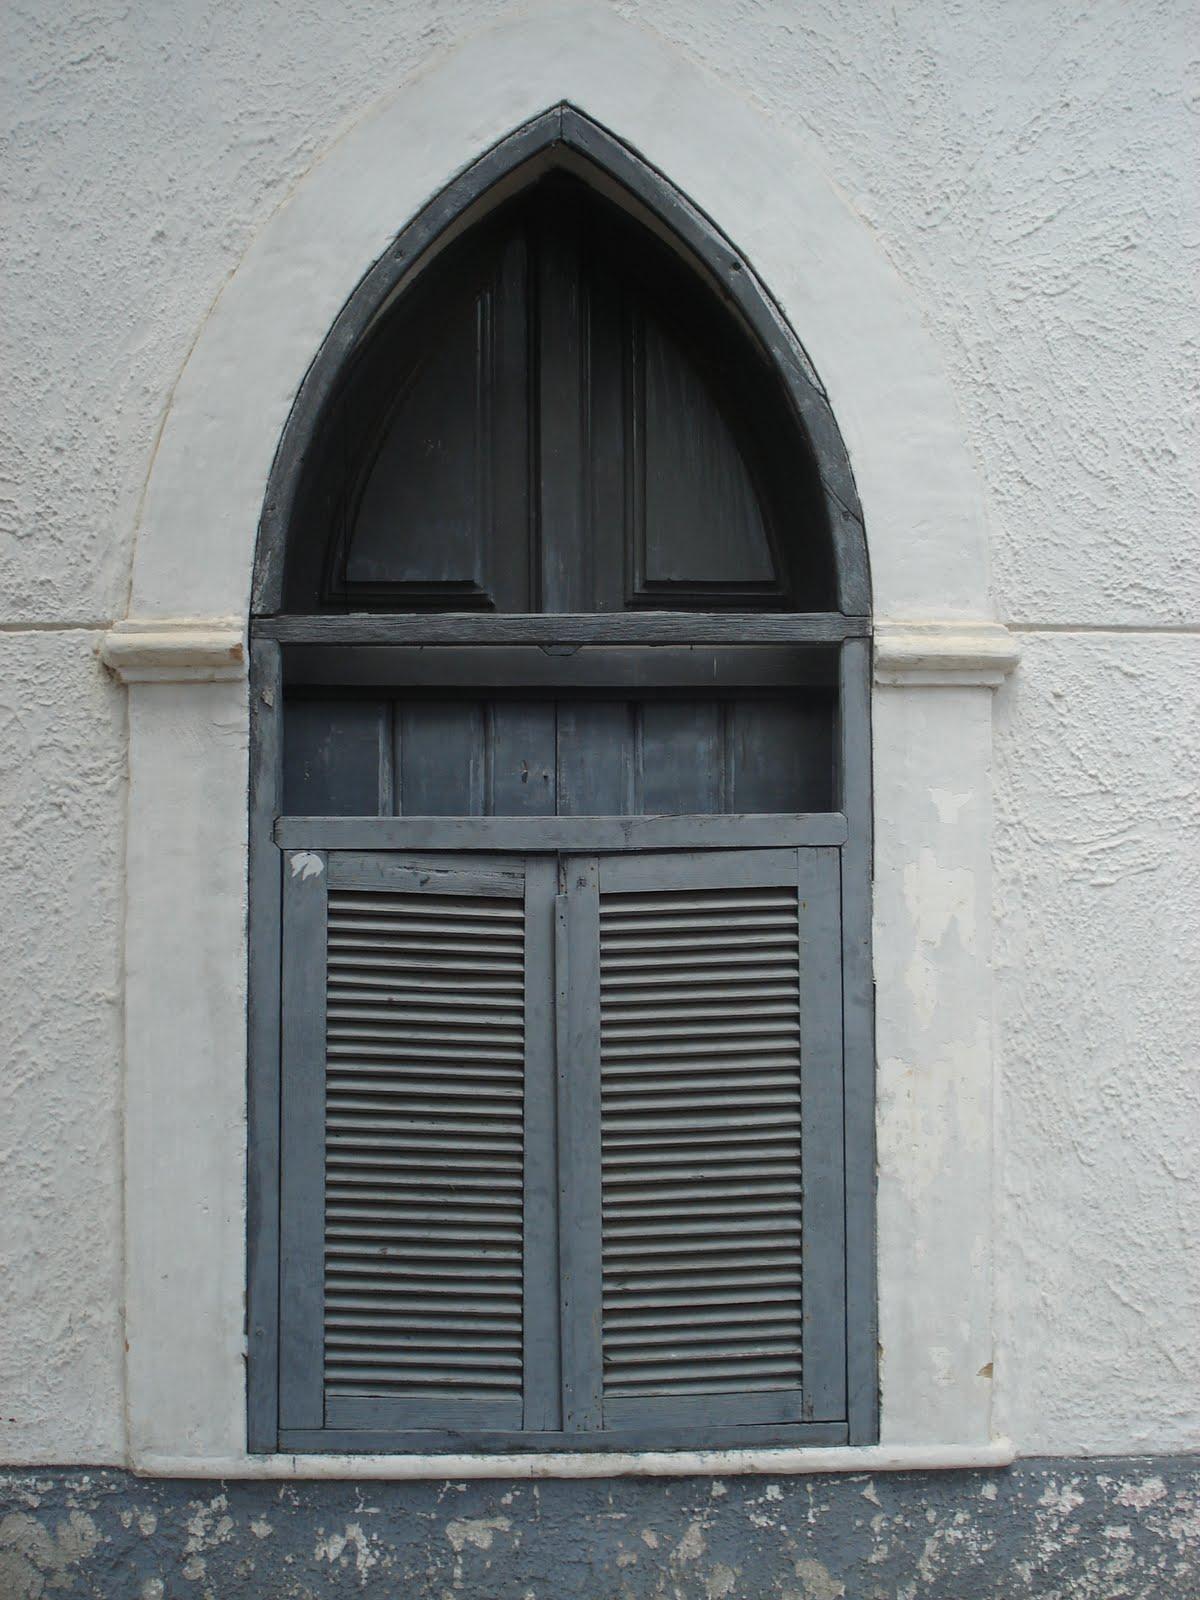 #475159 Etc Janelas da arquitetura piauiense Entretextos Dilson Lages  474 Janelas Duplas Madeira